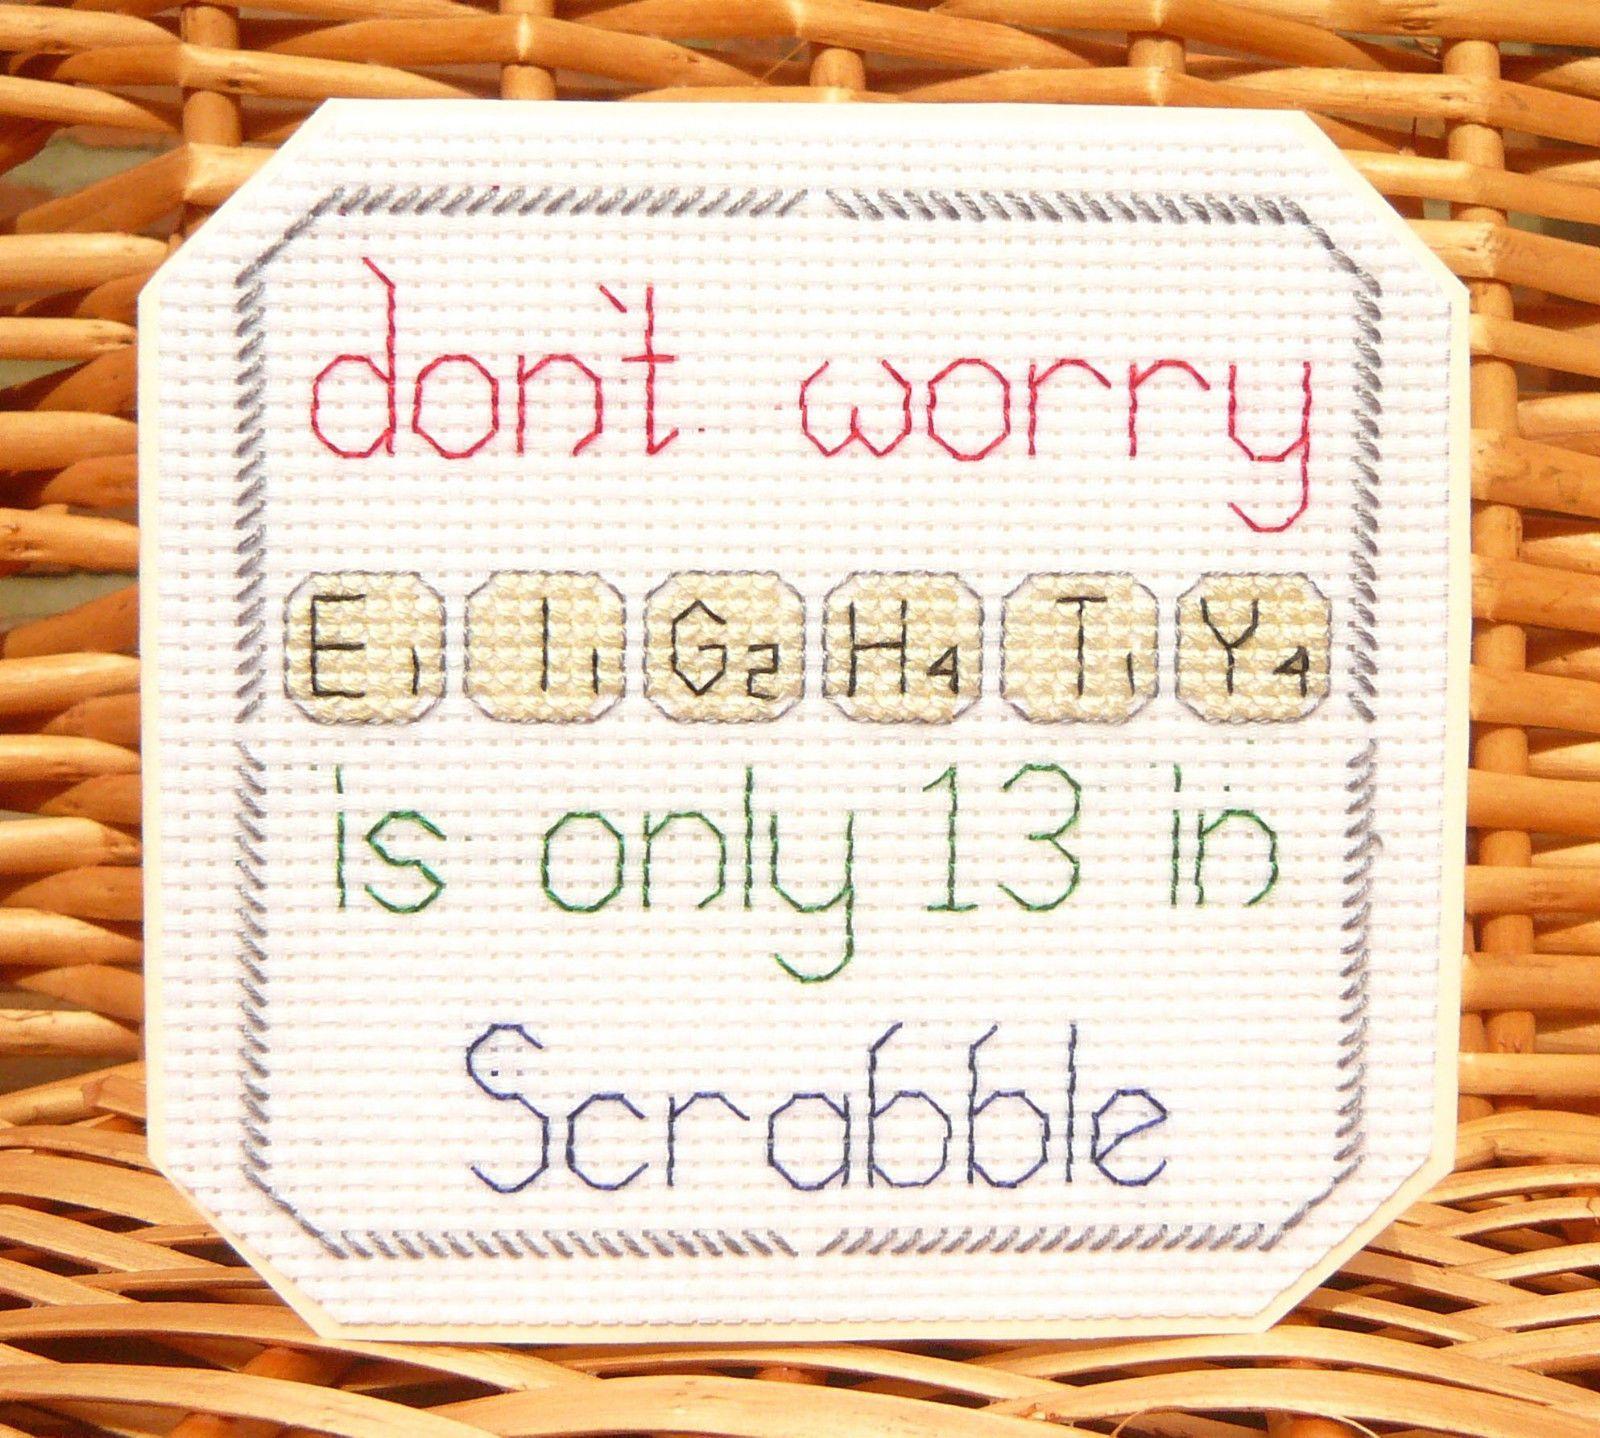 30th 40th 50th 60th 70th 80th 90th Scrabble Birthday Card